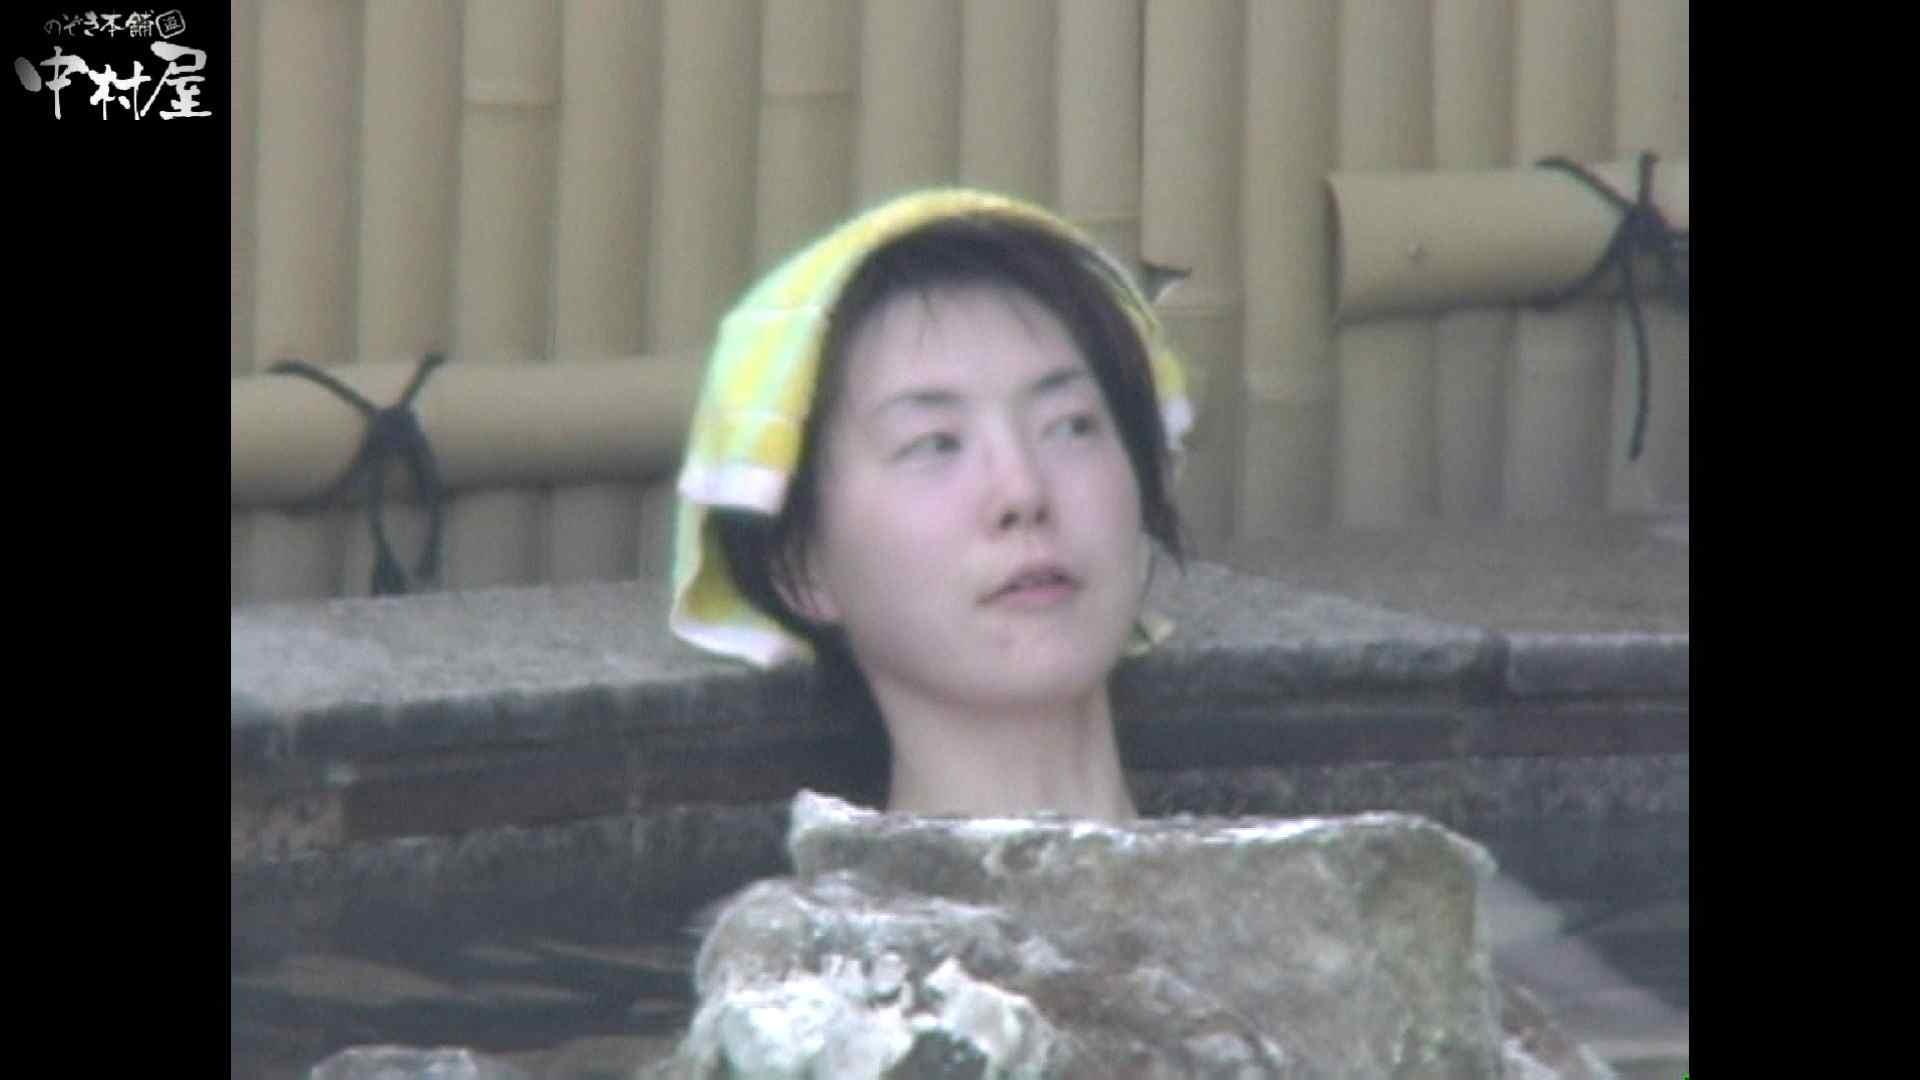 Aquaな露天風呂Vol.938 露天 濡れ場動画紹介 111pic 59